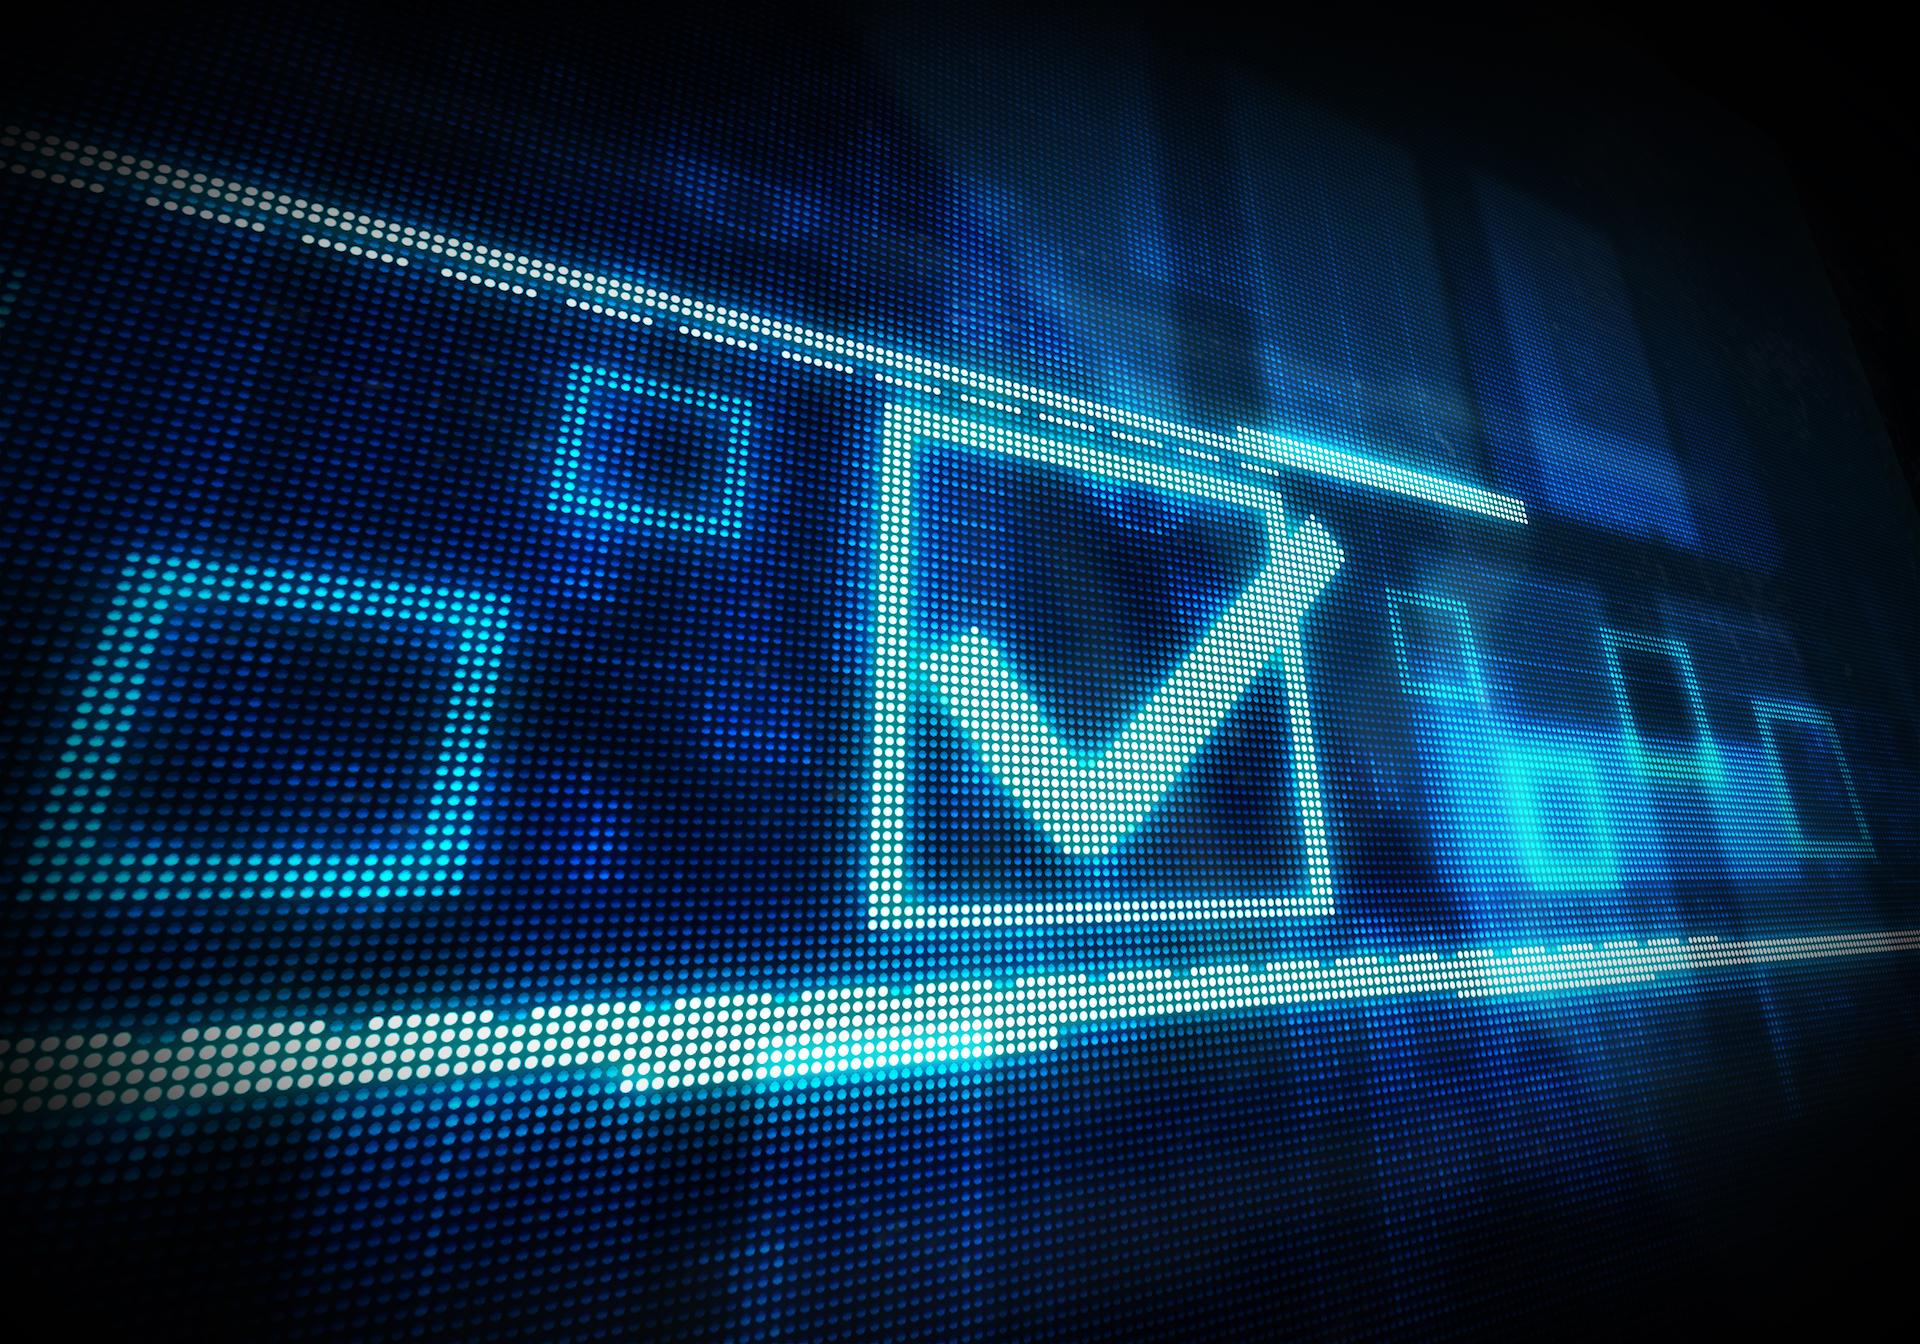 blue digital check box answers test survey census